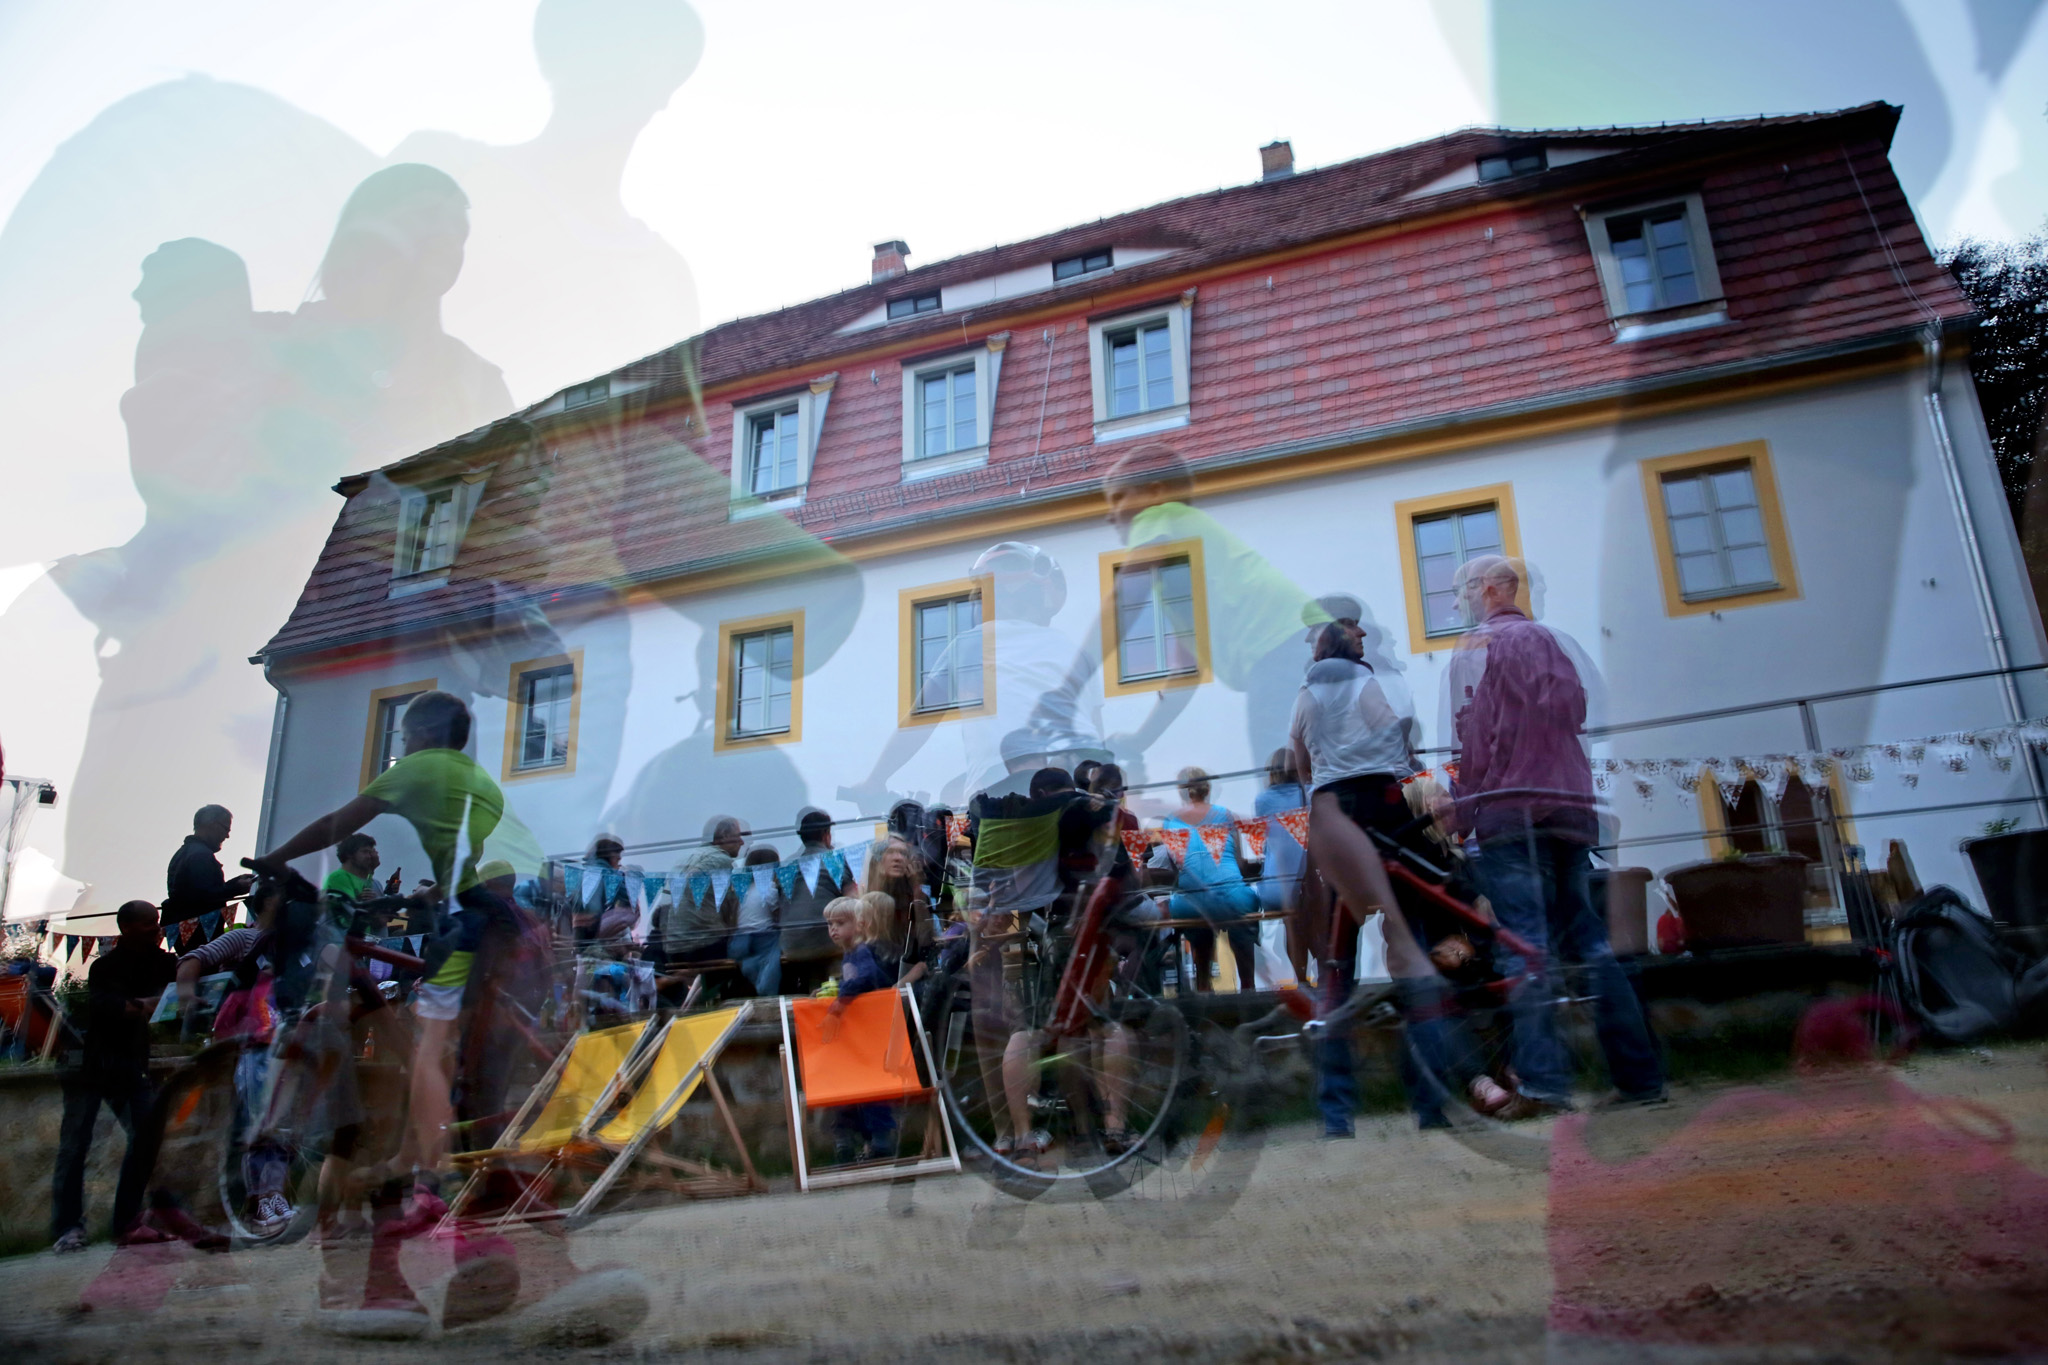 ORLA-Gründungsfest am 25. Mai 2018; Foto: Matthias Schumann © ORLA e.V.